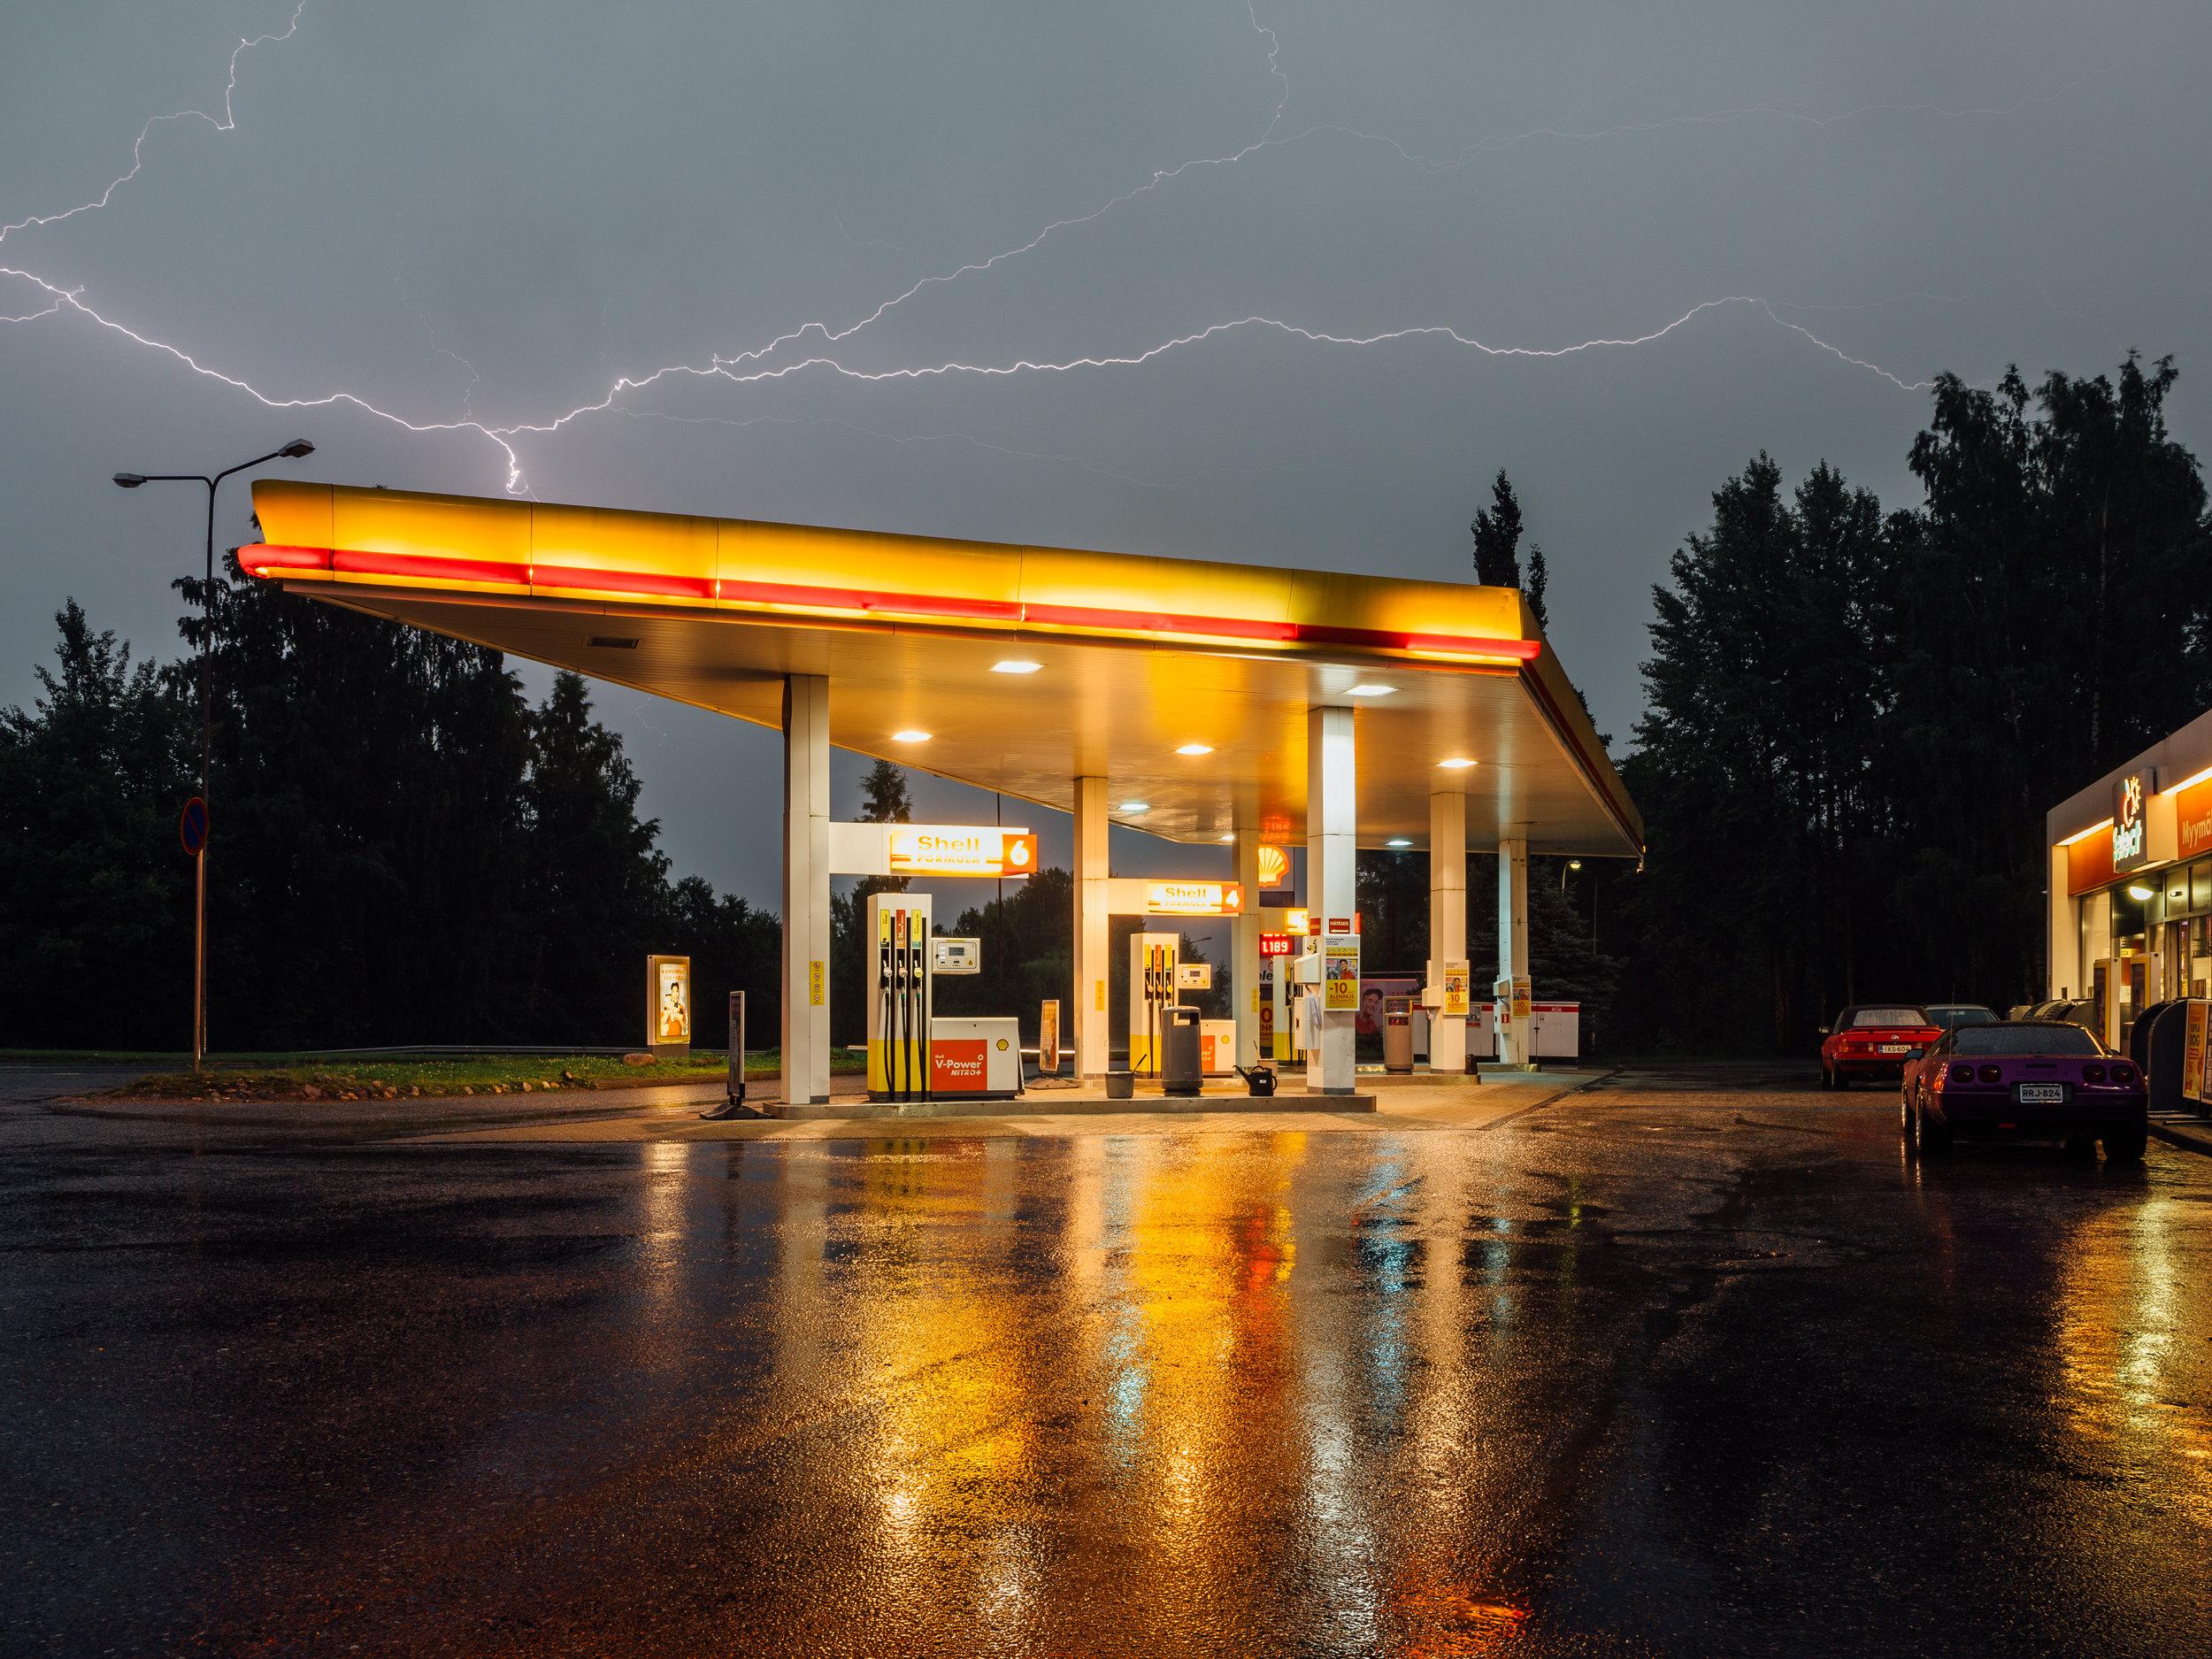 Shell, Lahti, Finland, August 2017